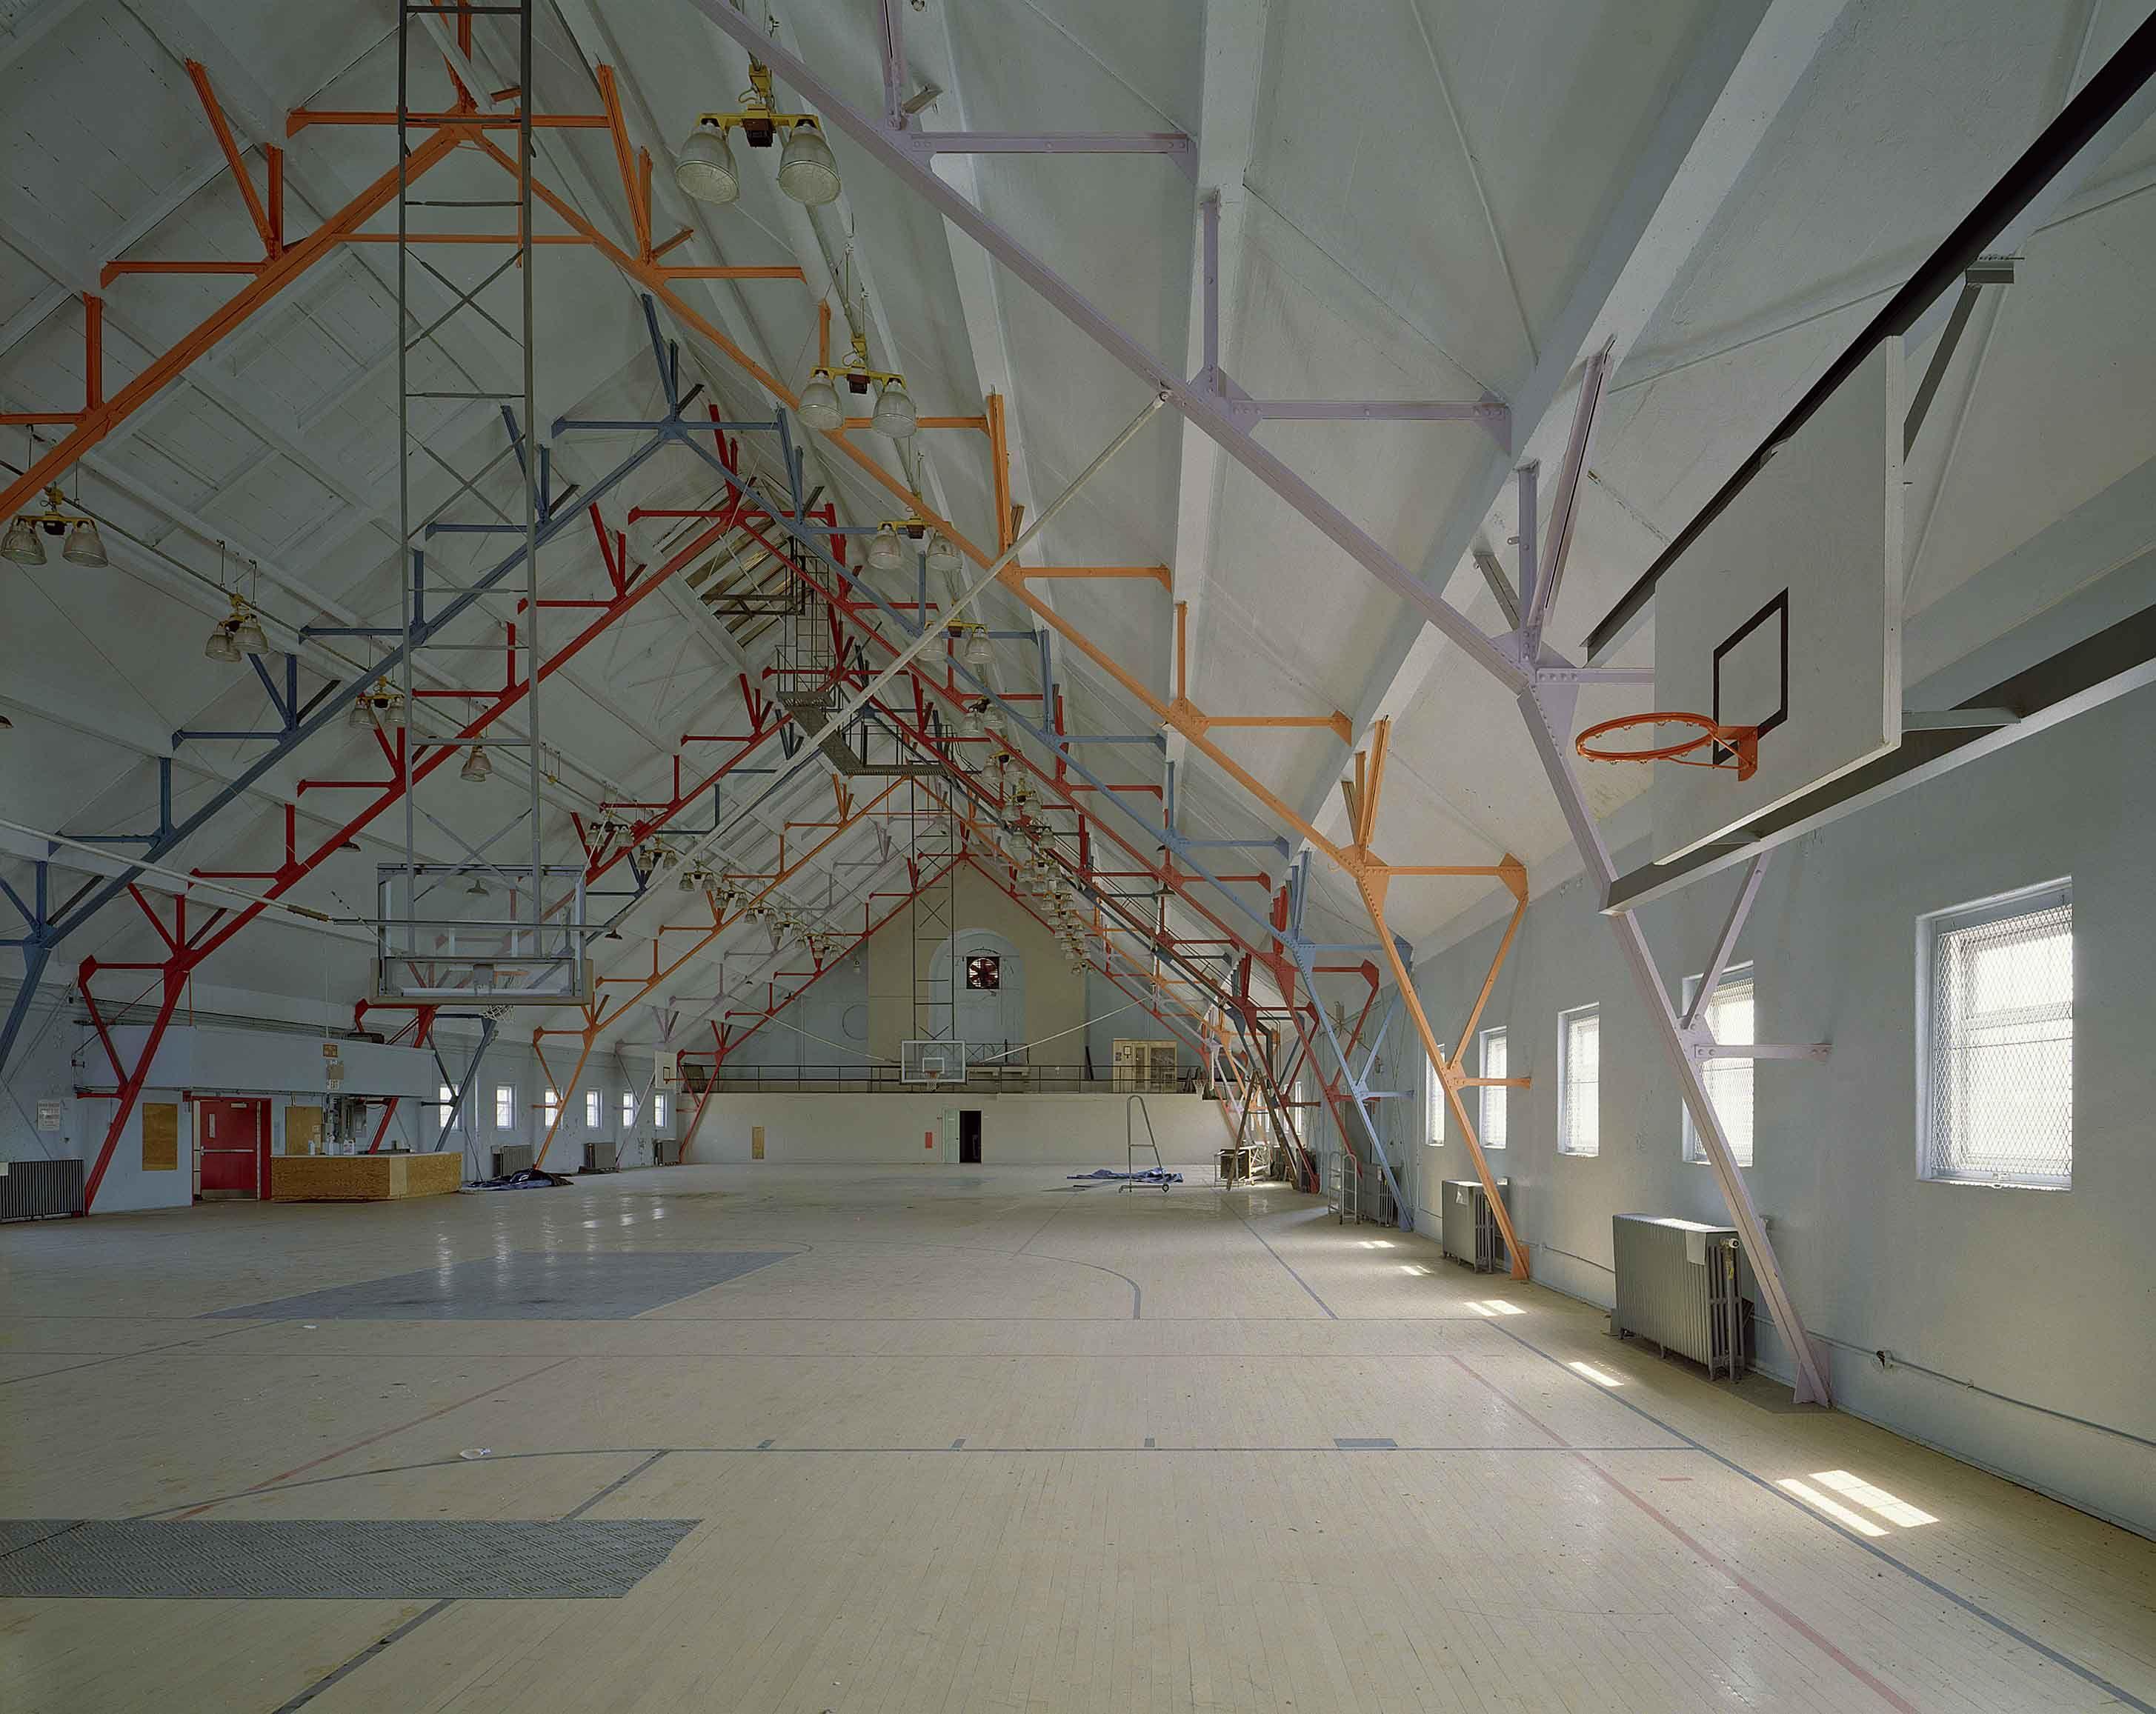 gymnasium.jpg (2910×2314) / 프레임 컬러.